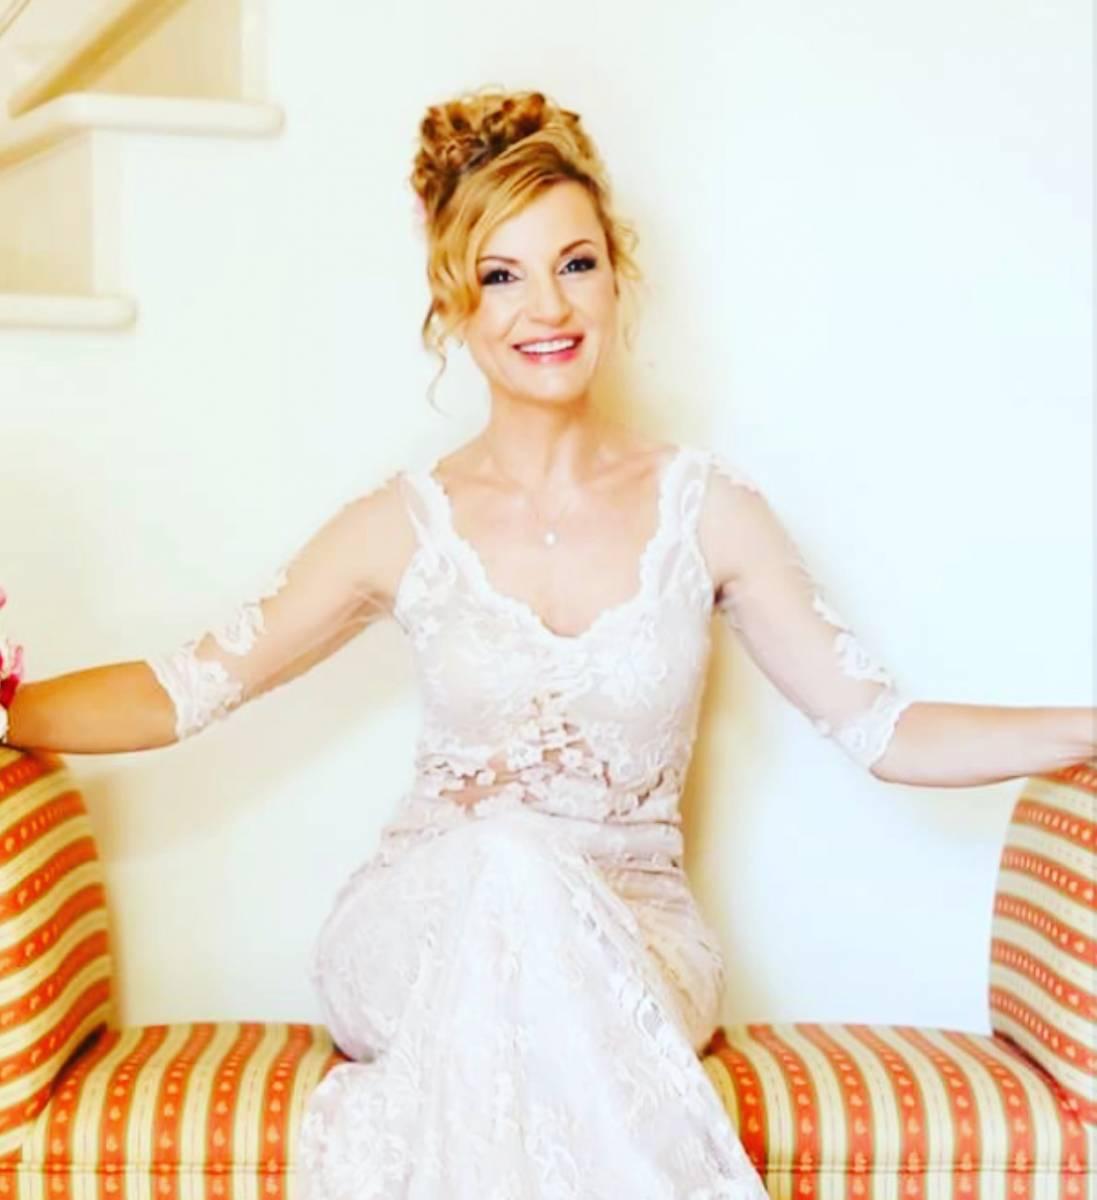 Michèle Feyaerts - Bruidskapsel - Bruidsmake-up - House of Weddings - 30